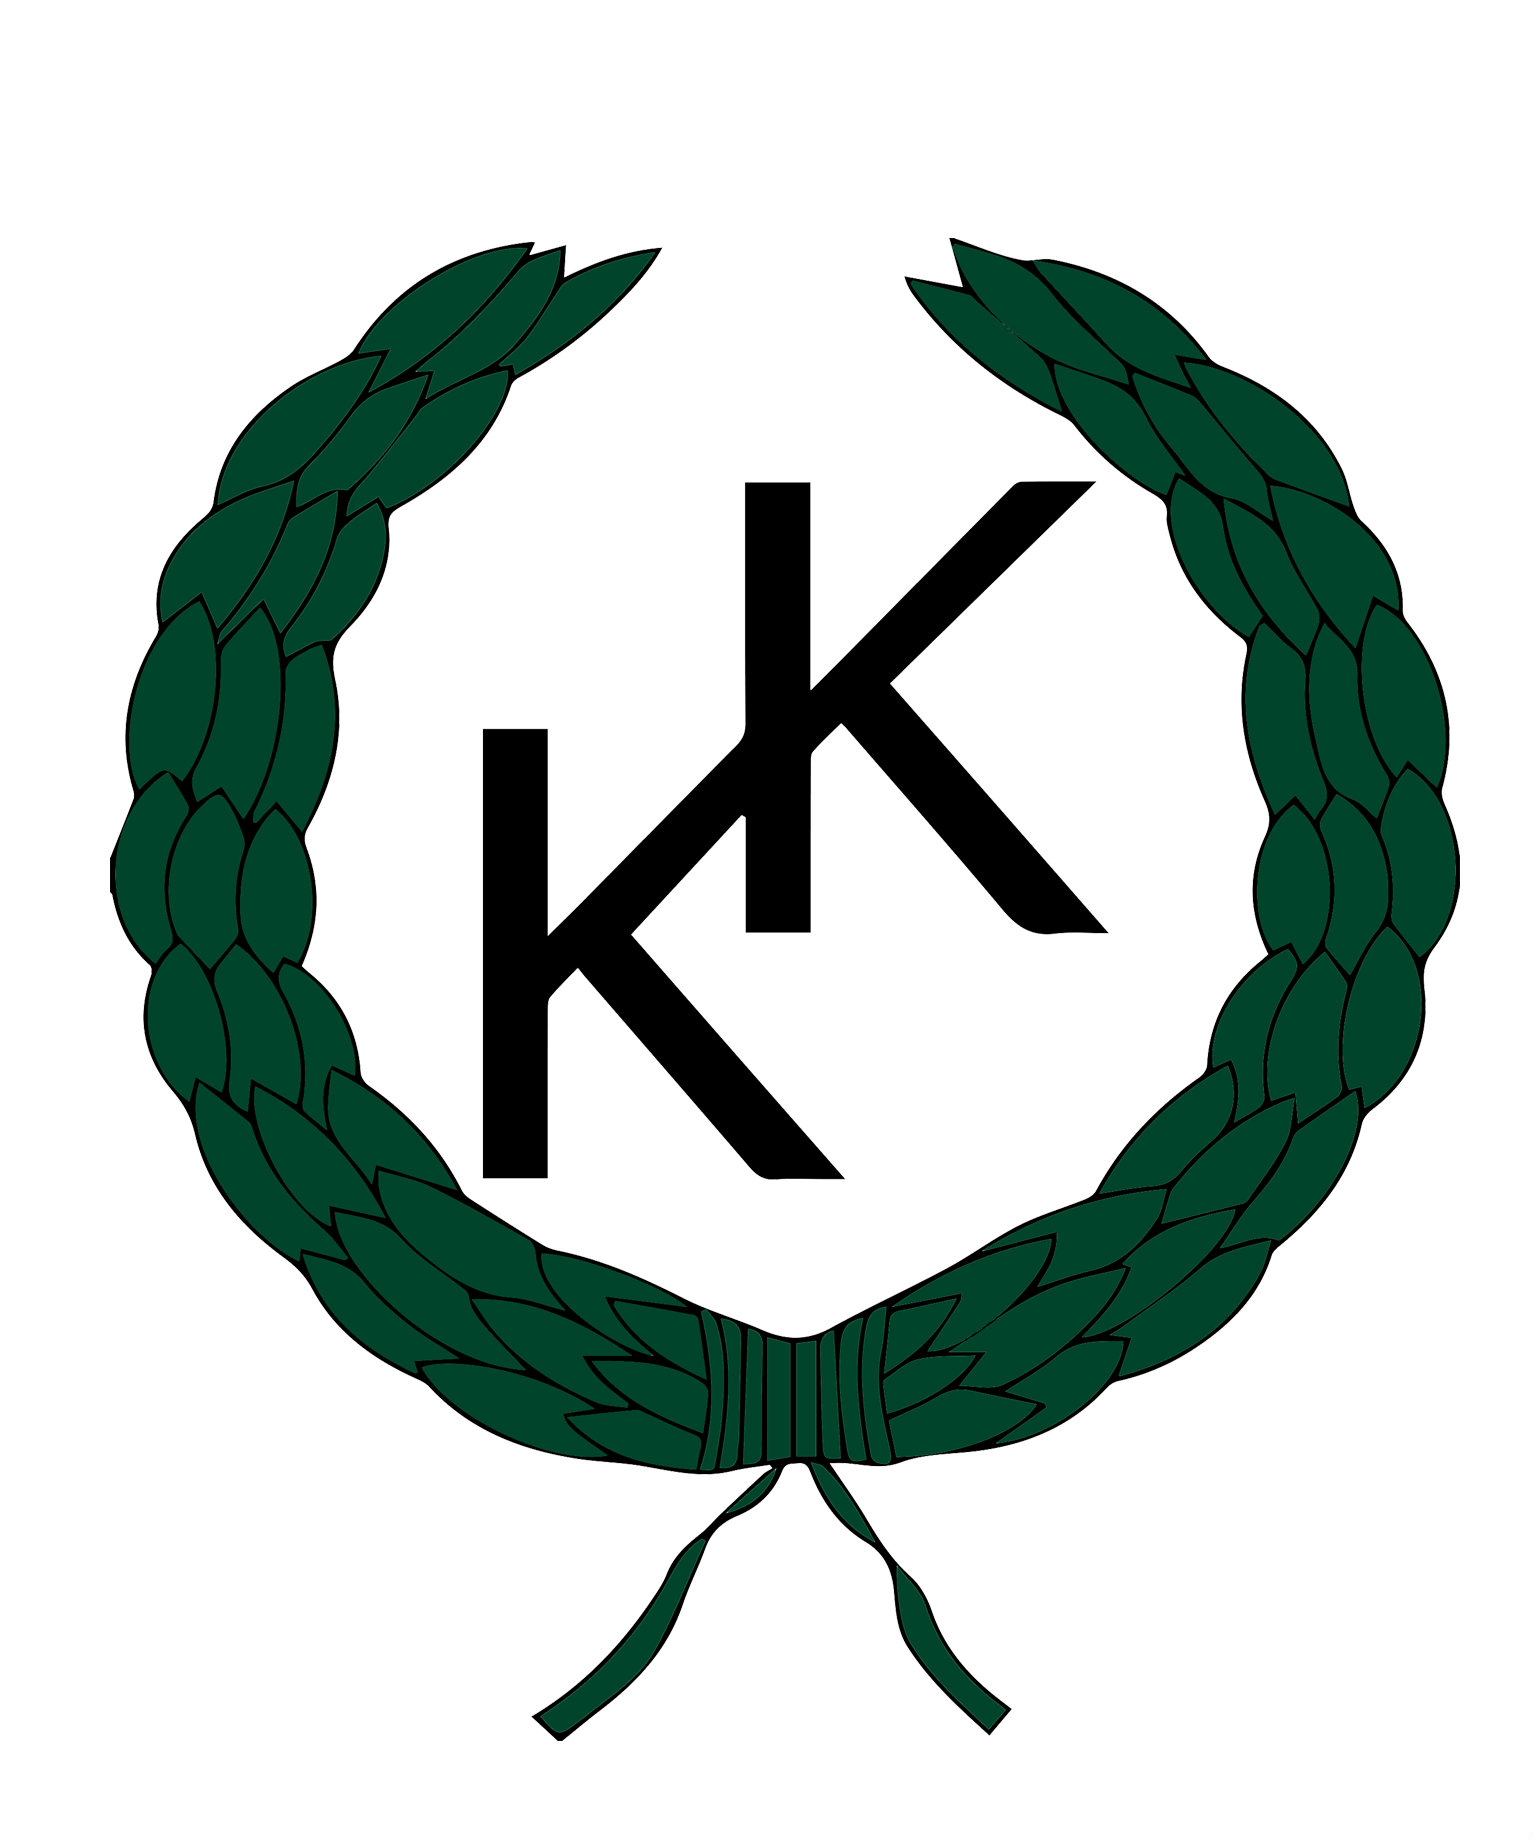 KK-logotyp liten grön